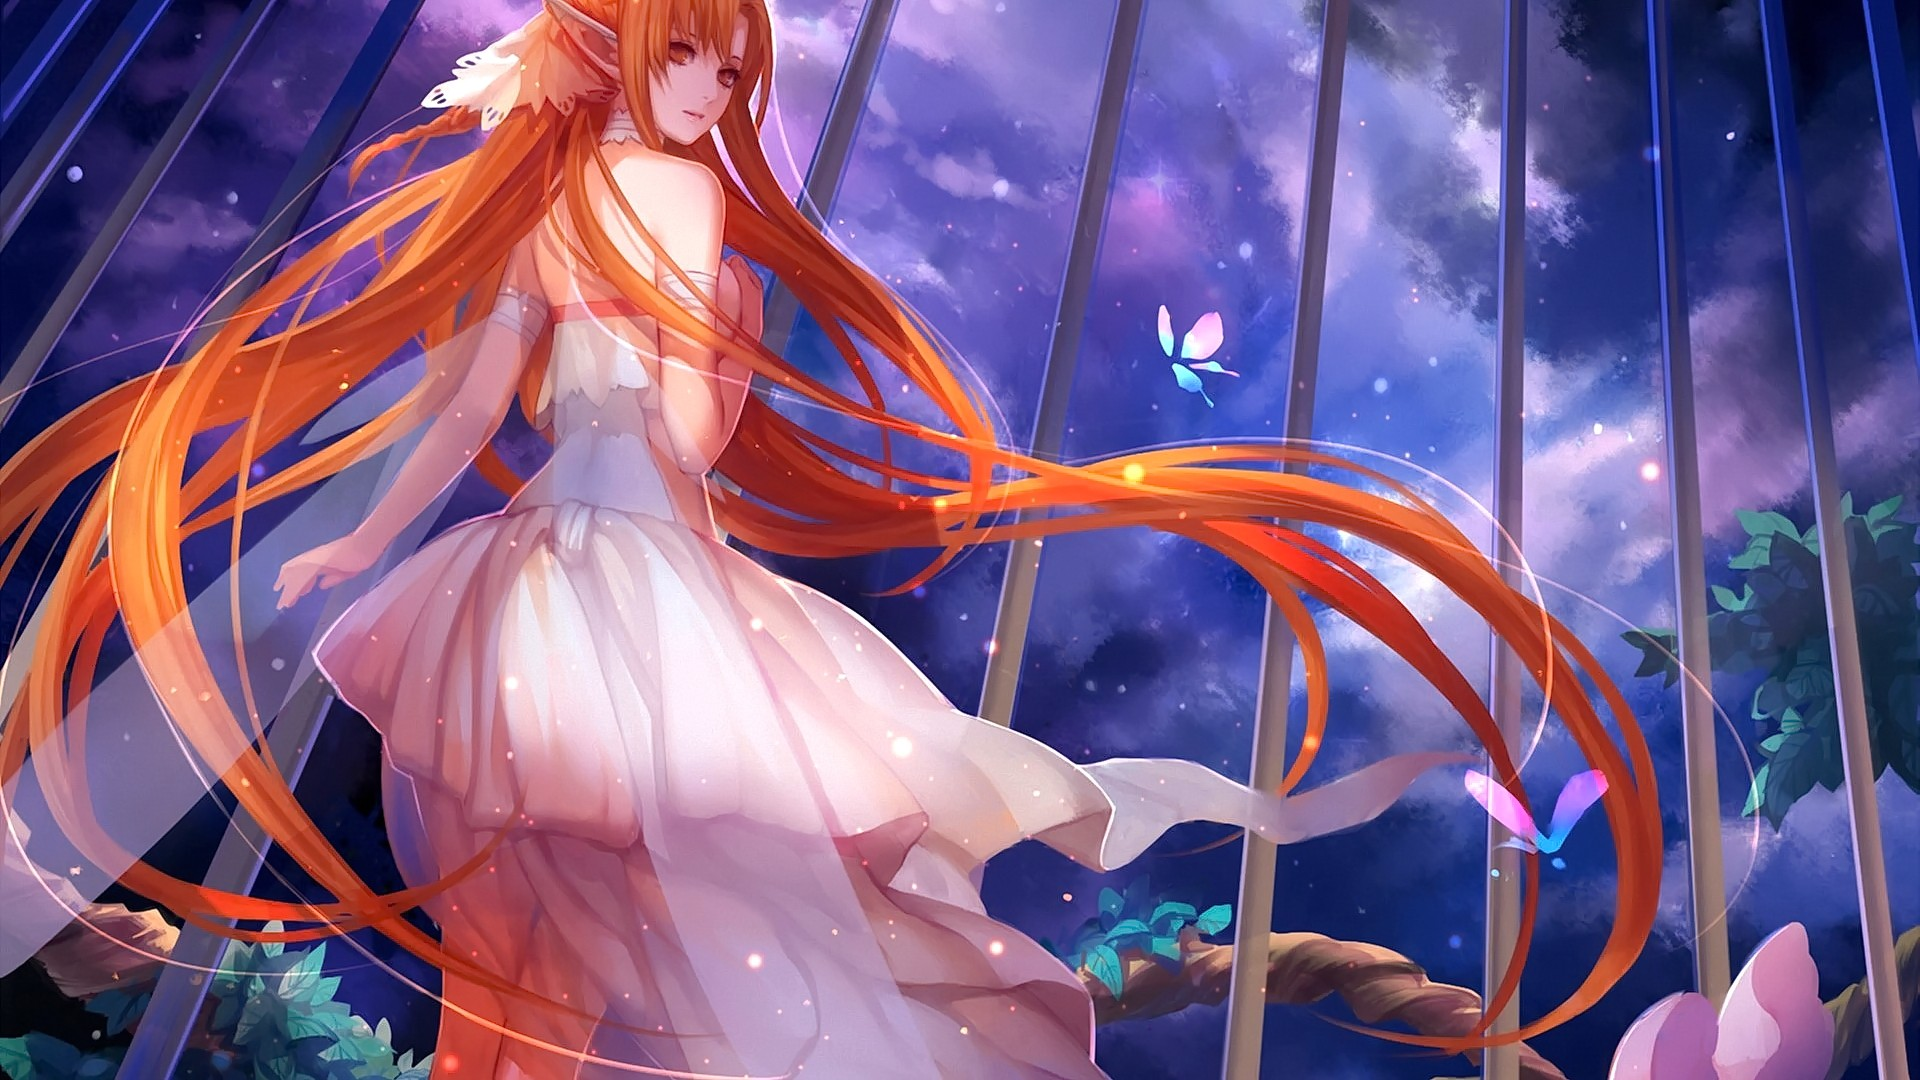 Anime 1920x1080 Sword Art Online Yuuki Asuna long hair white dress wings fairies butterfly plants night clouds anime girls anime brown eyes looking at viewer redhead